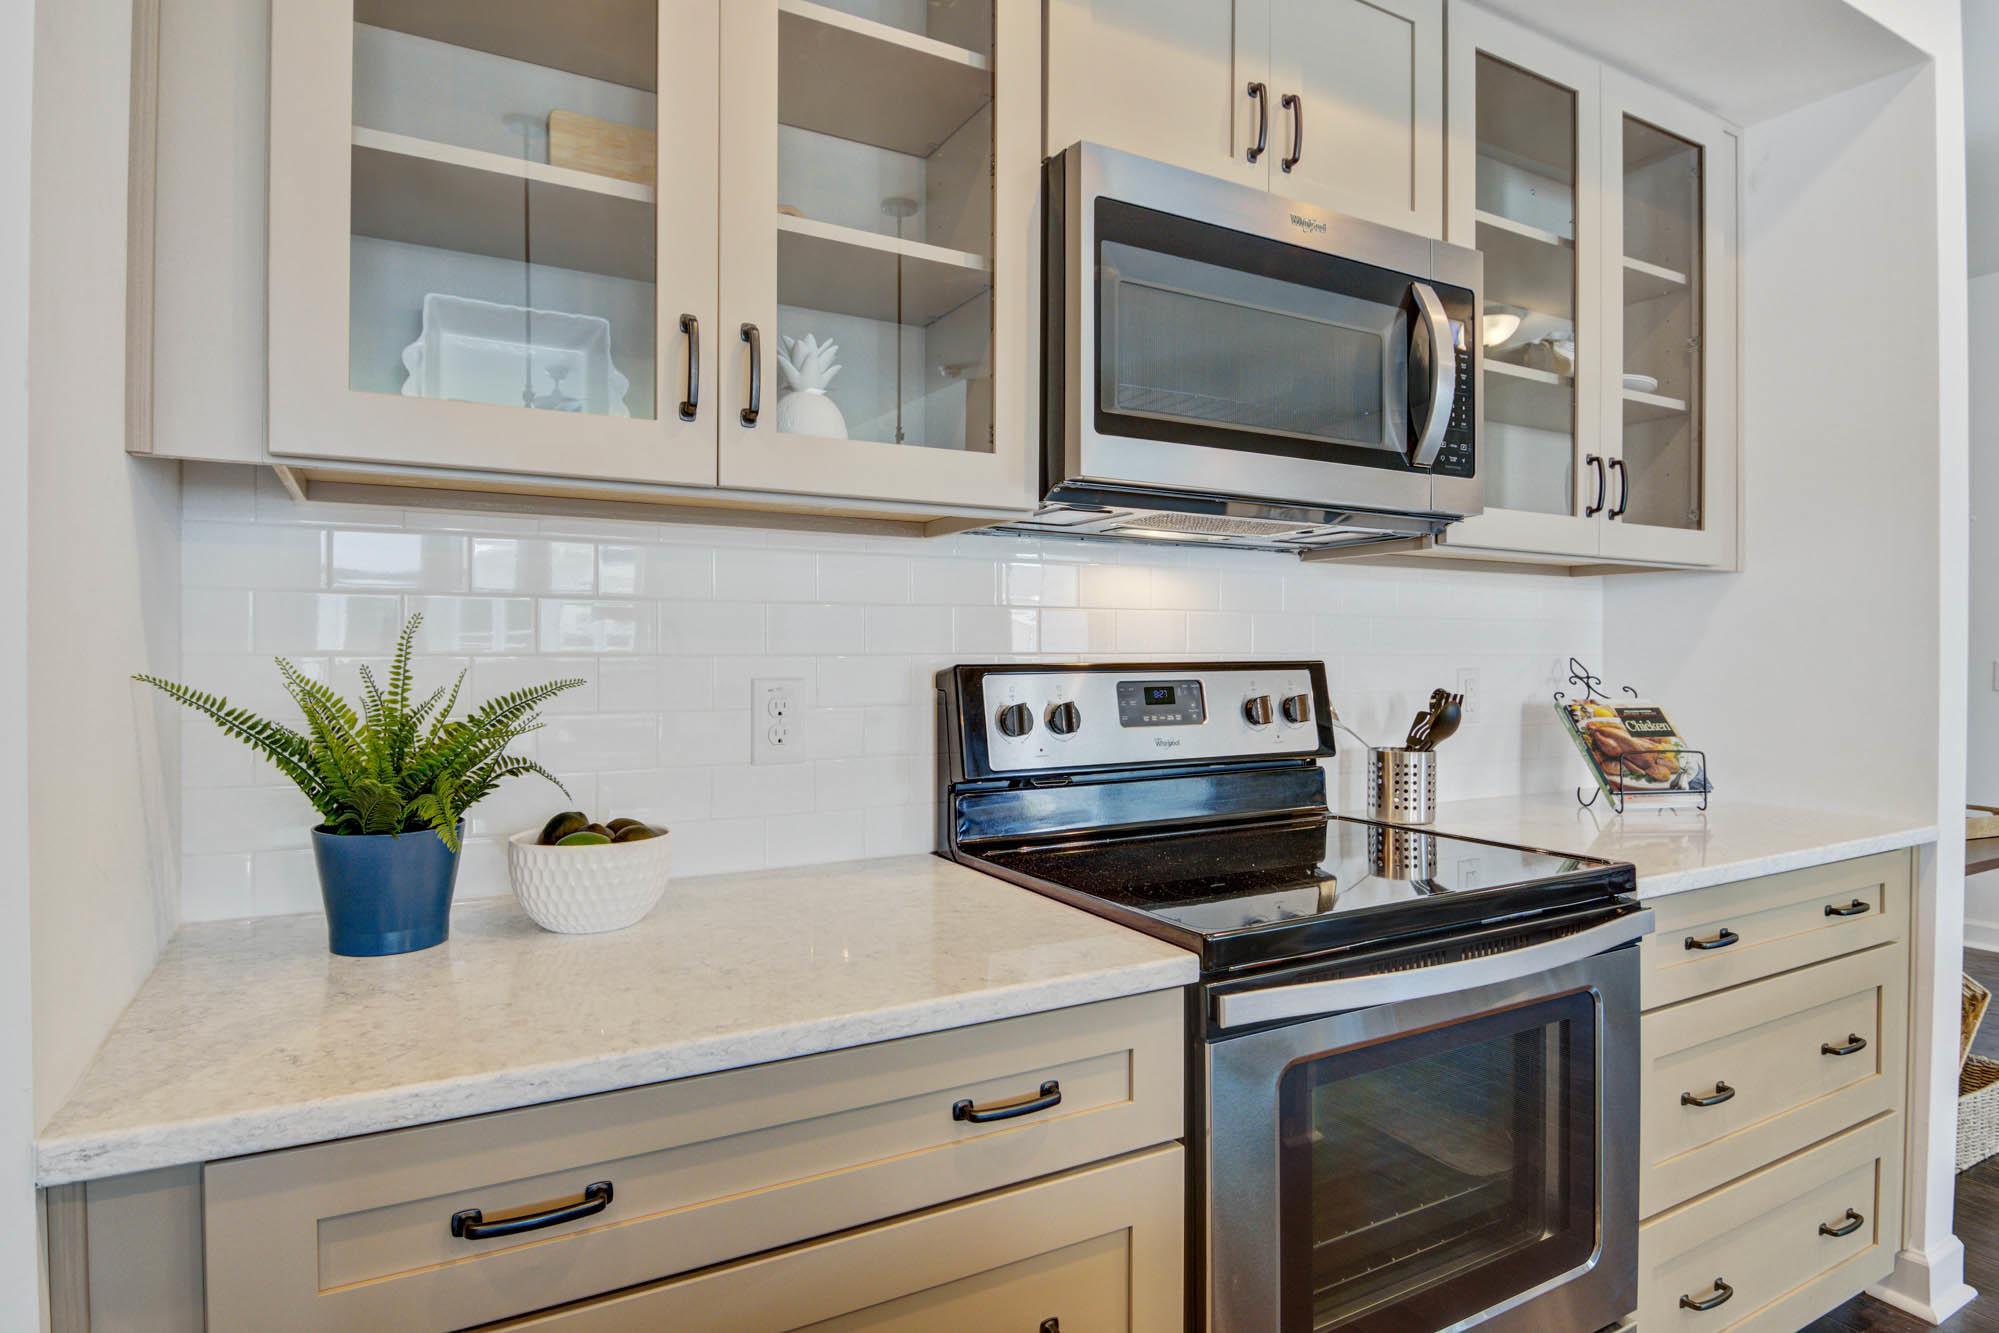 Marshview Commons Homes For Sale - 530 Mclernon, Johns Island, SC - 18